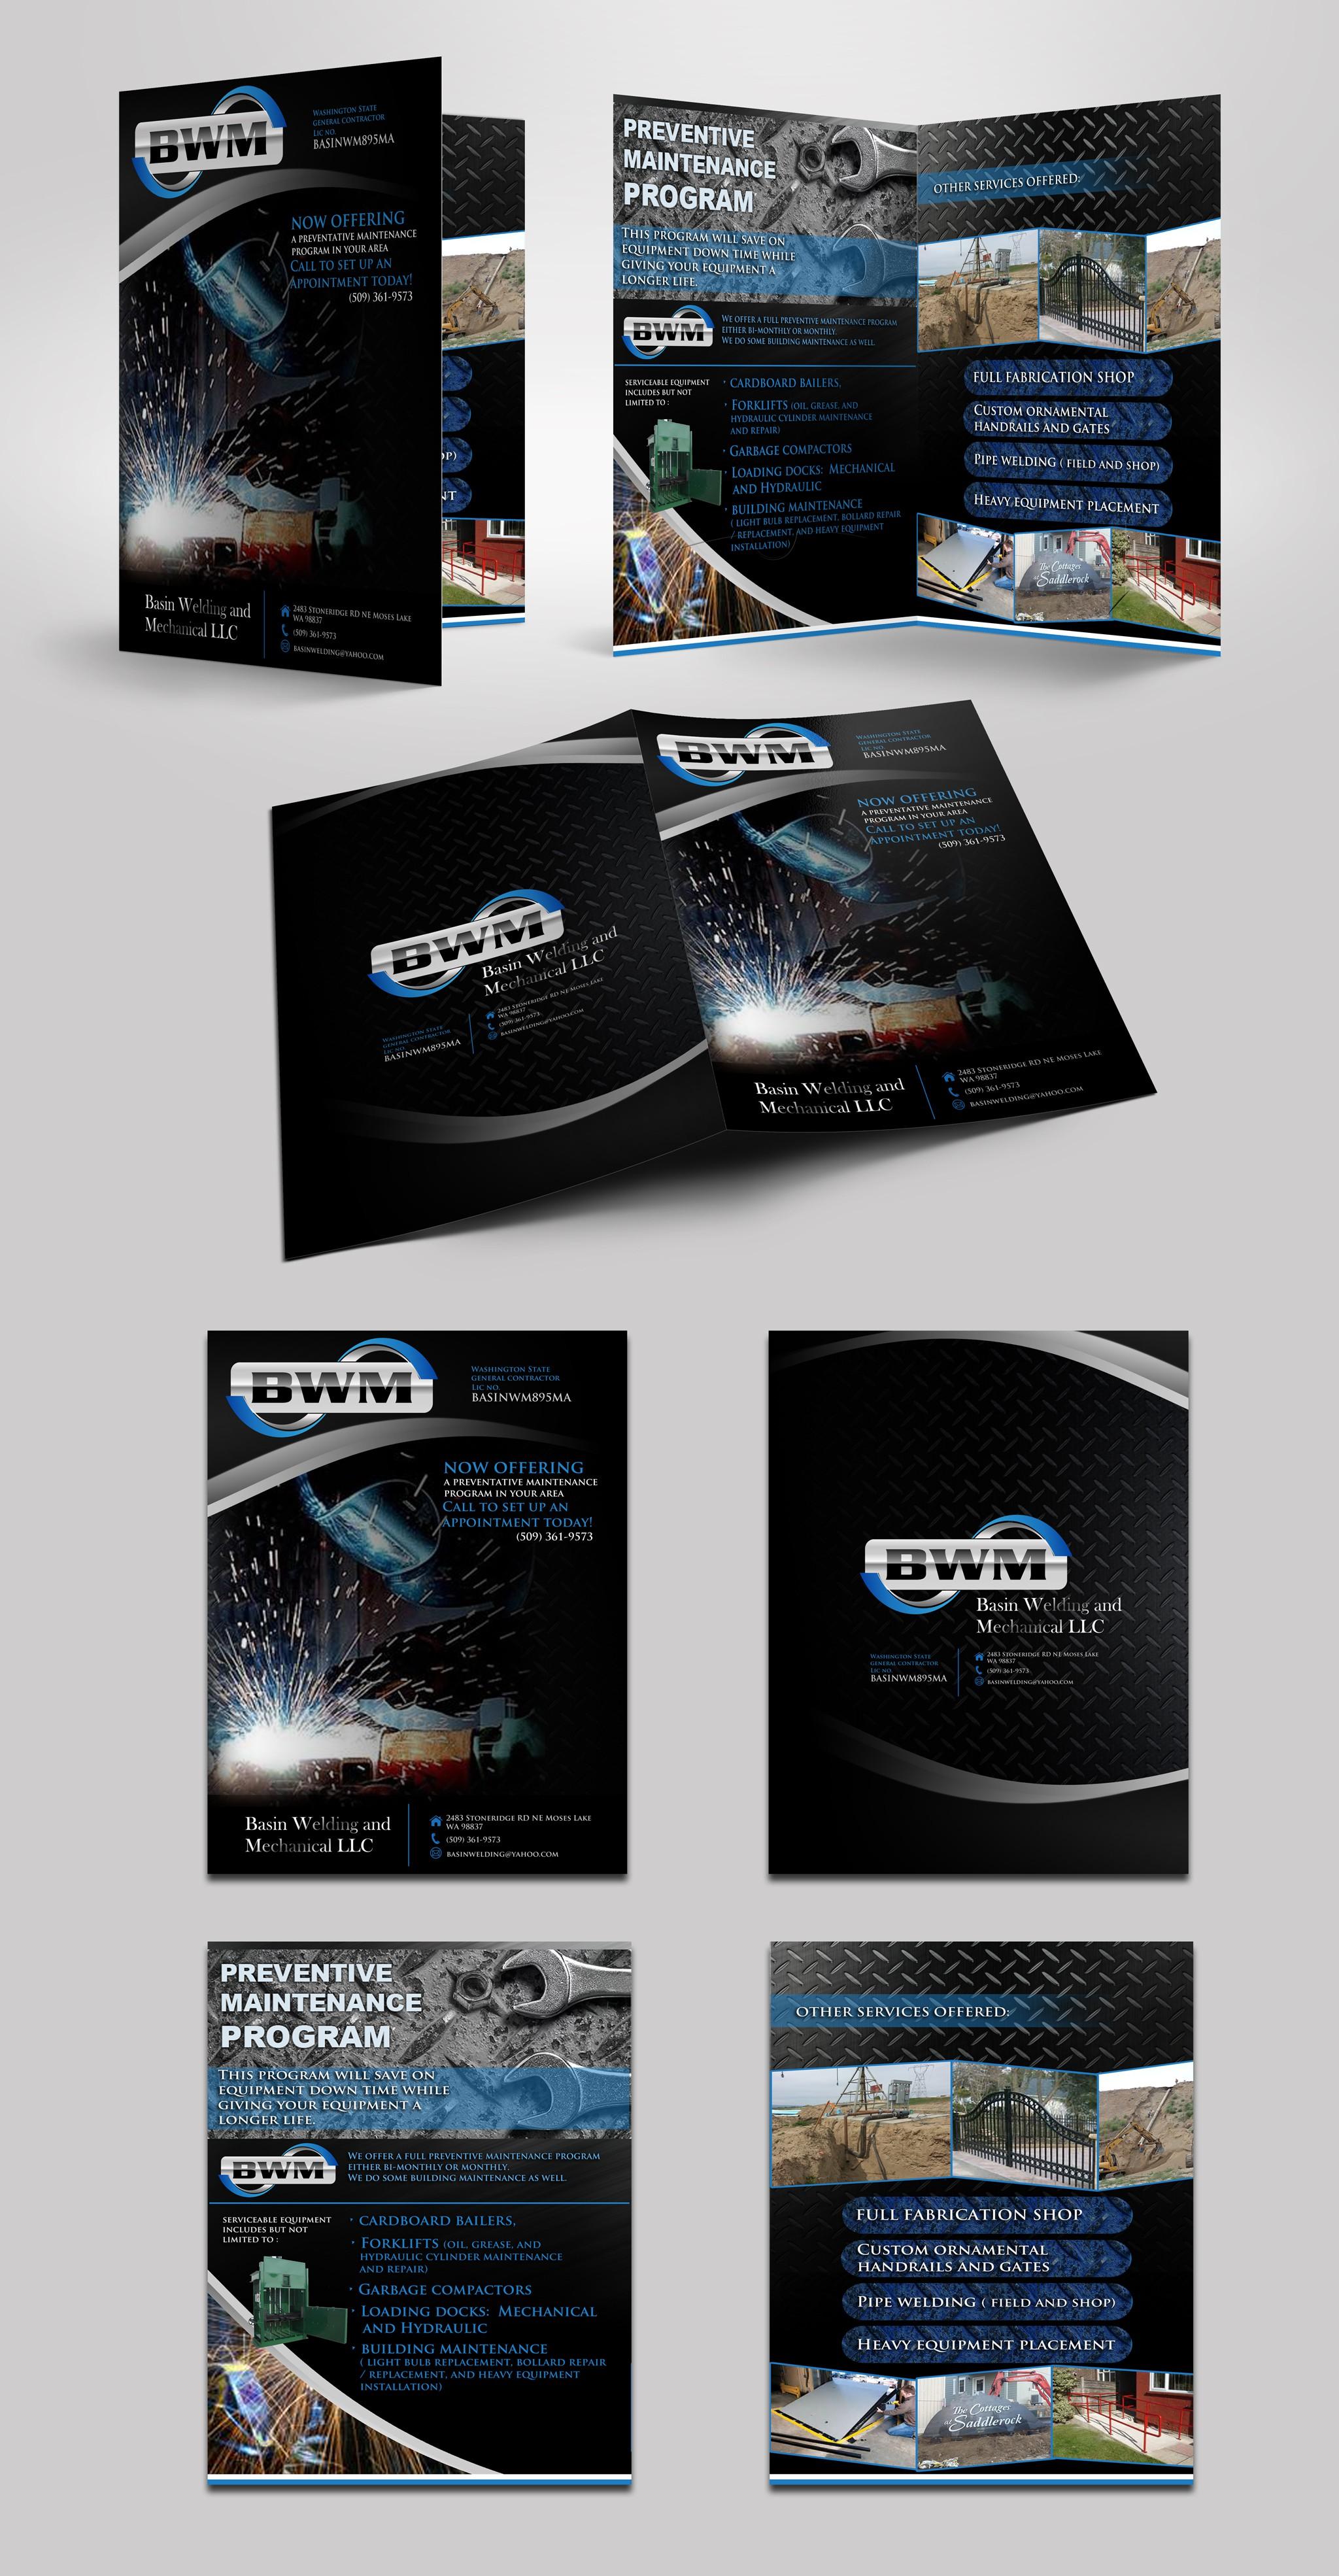 Design an attractive Brochure for Basin Welding and Mechanical LLC